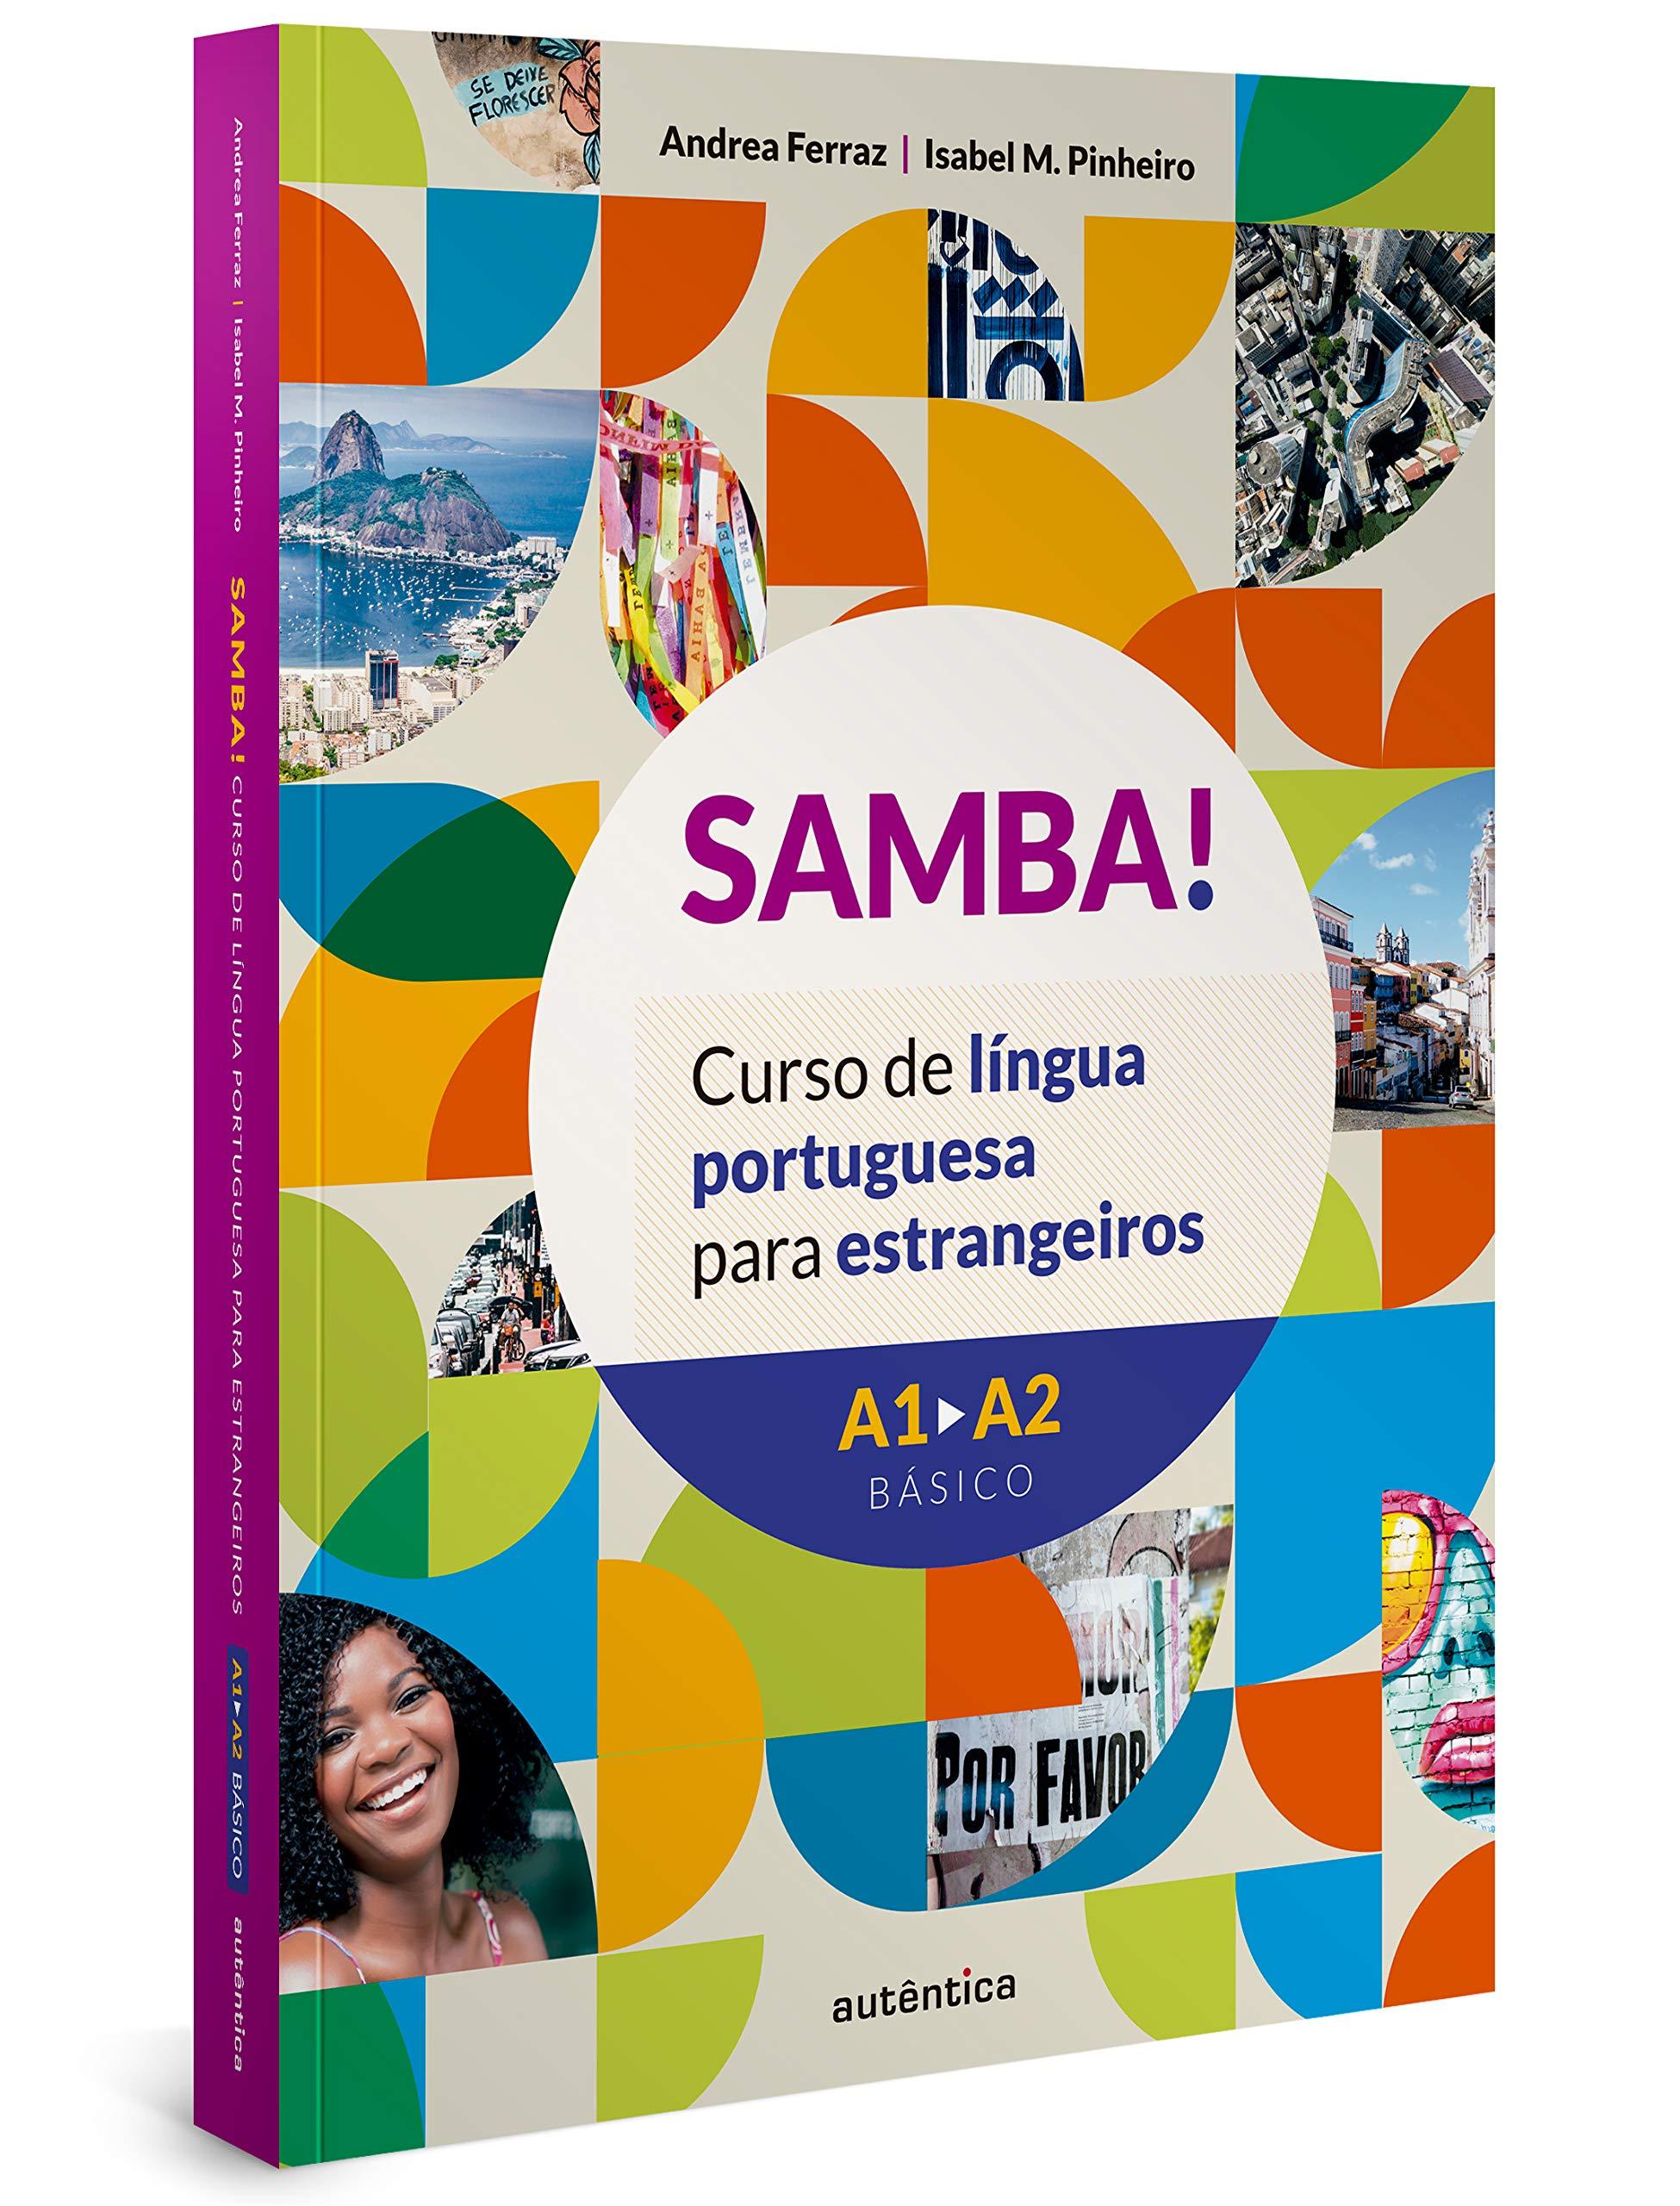 Samba Curso De Lingua Portuguesa Para Estrangeiros Em Portugues Do Brasil Andrea Ferraz Amazon De Bücher